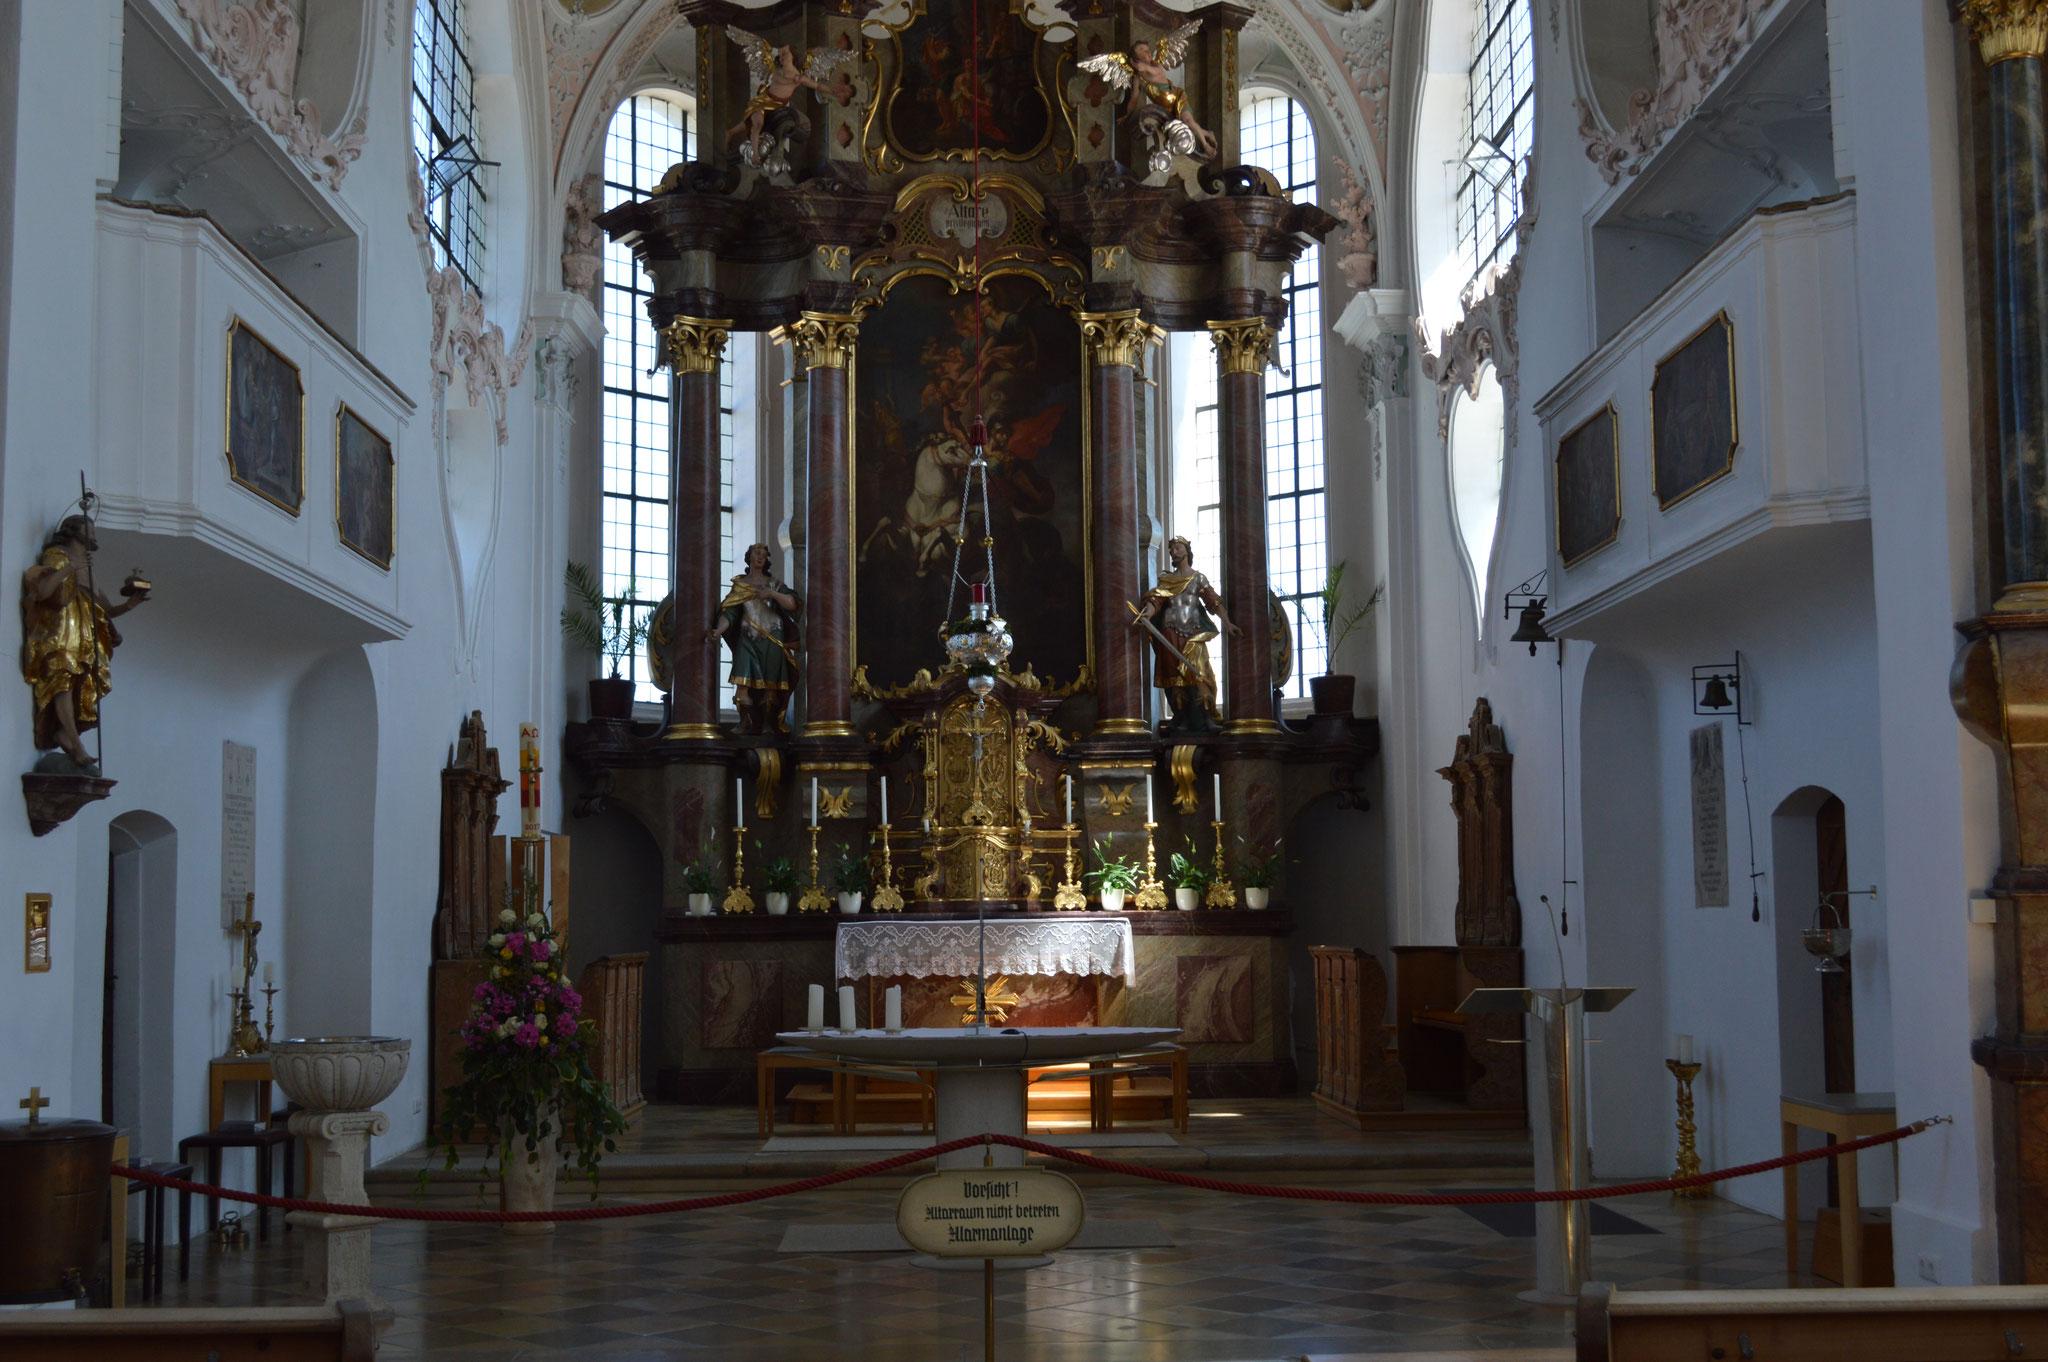 Altarraum der Pfarrkirche